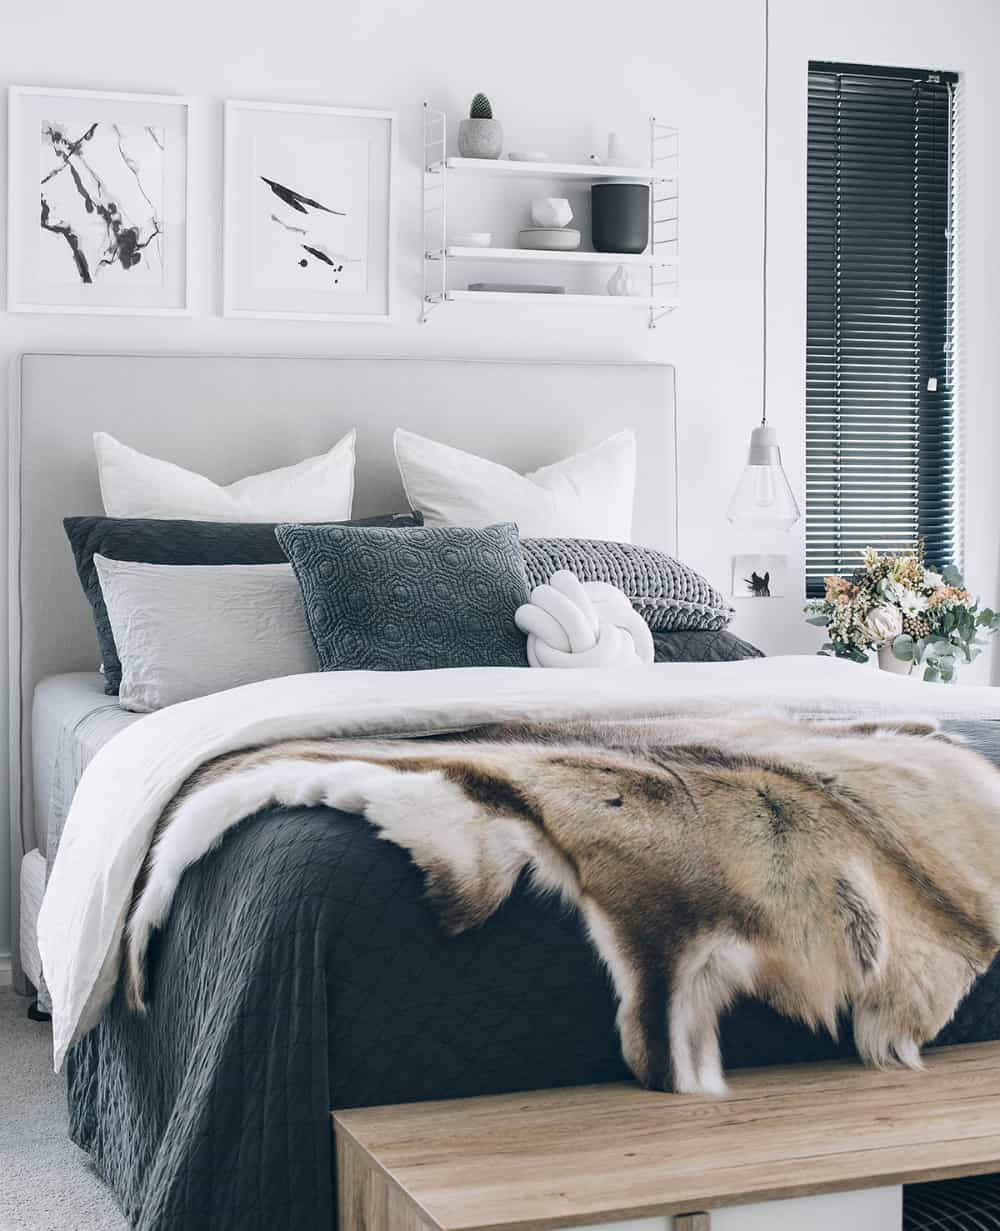 Cool bedroom decor